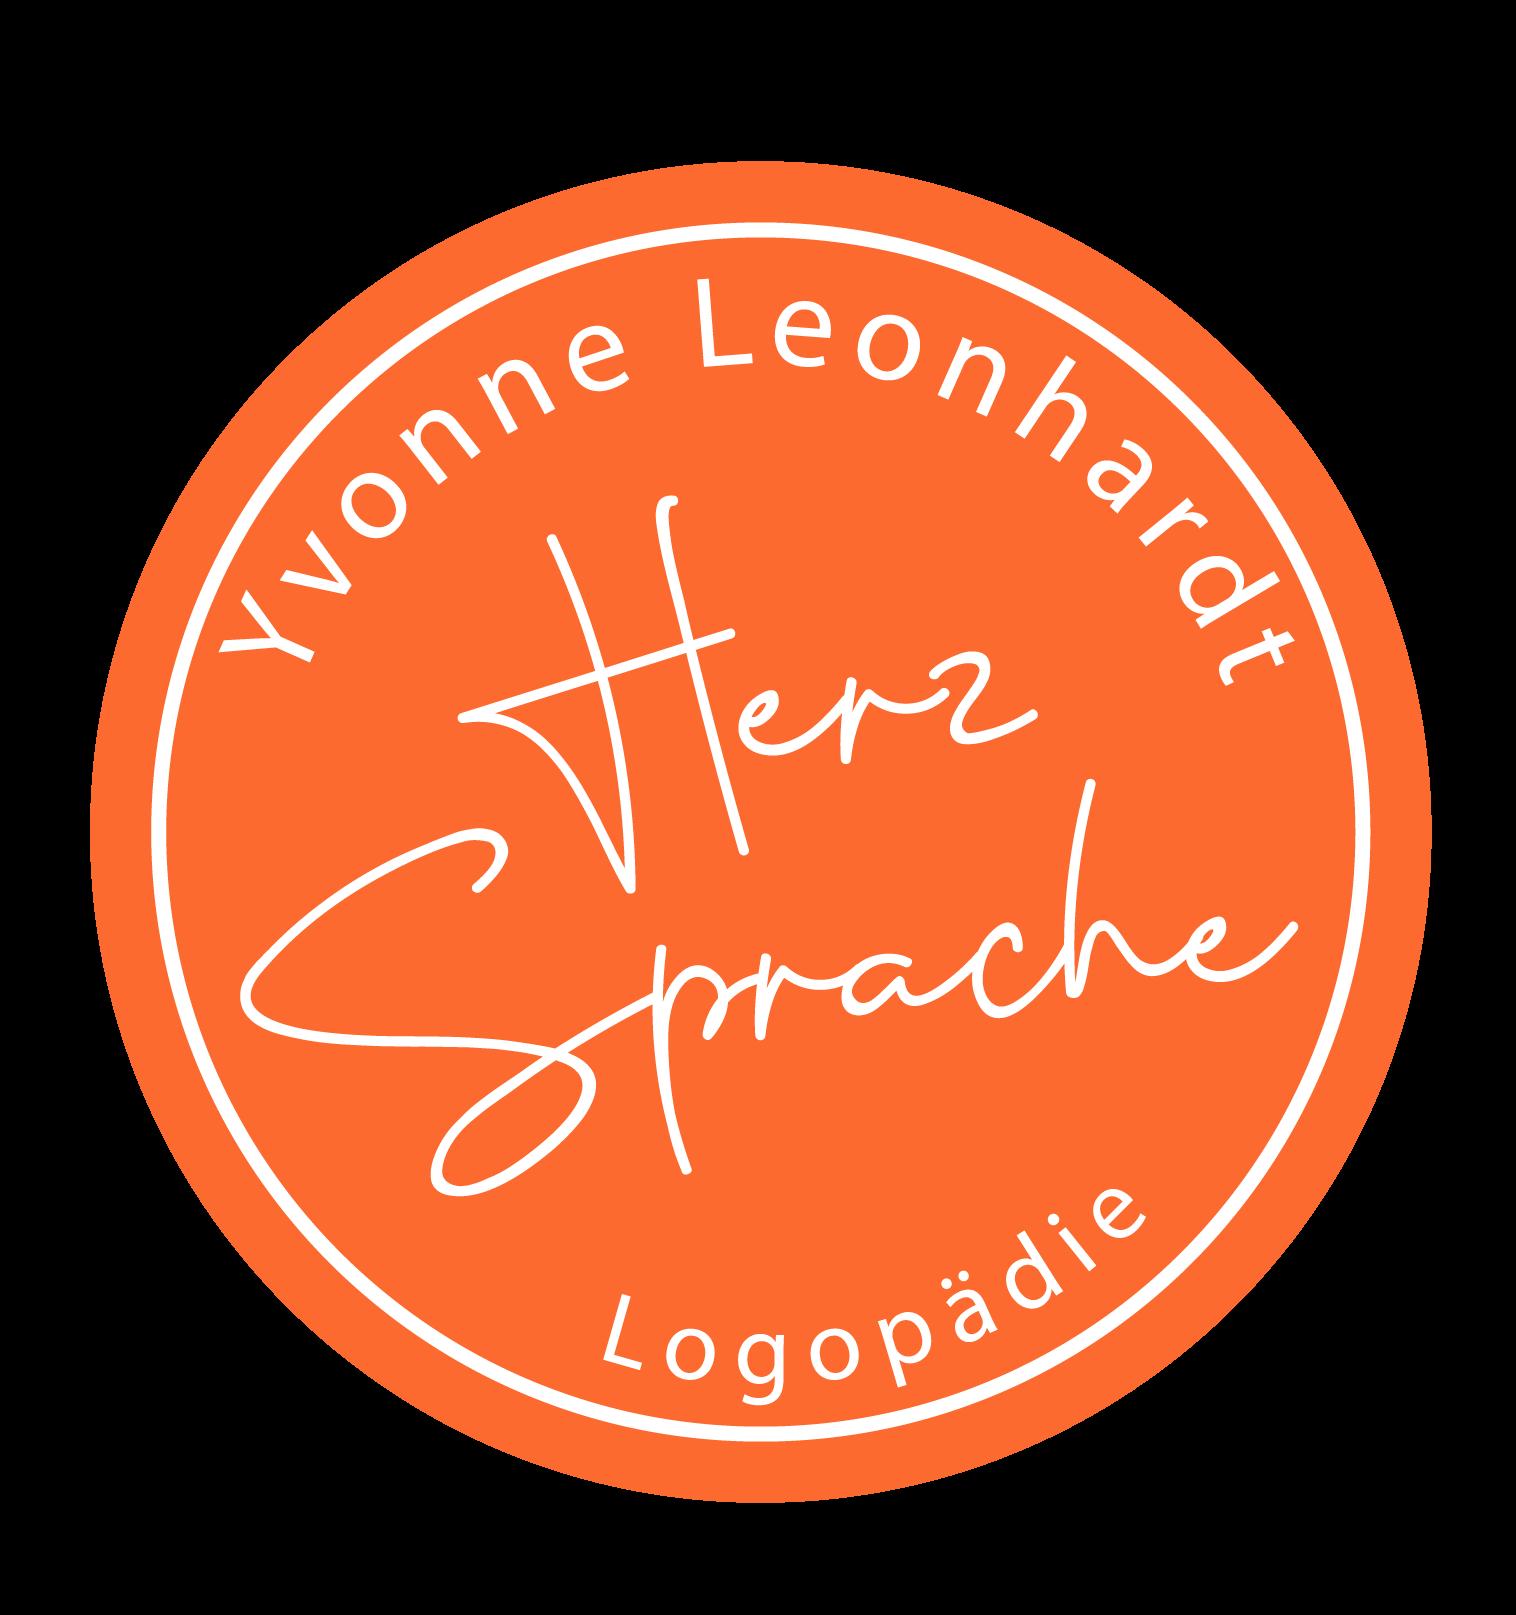 Logopädie - Yvonne Leonhardt